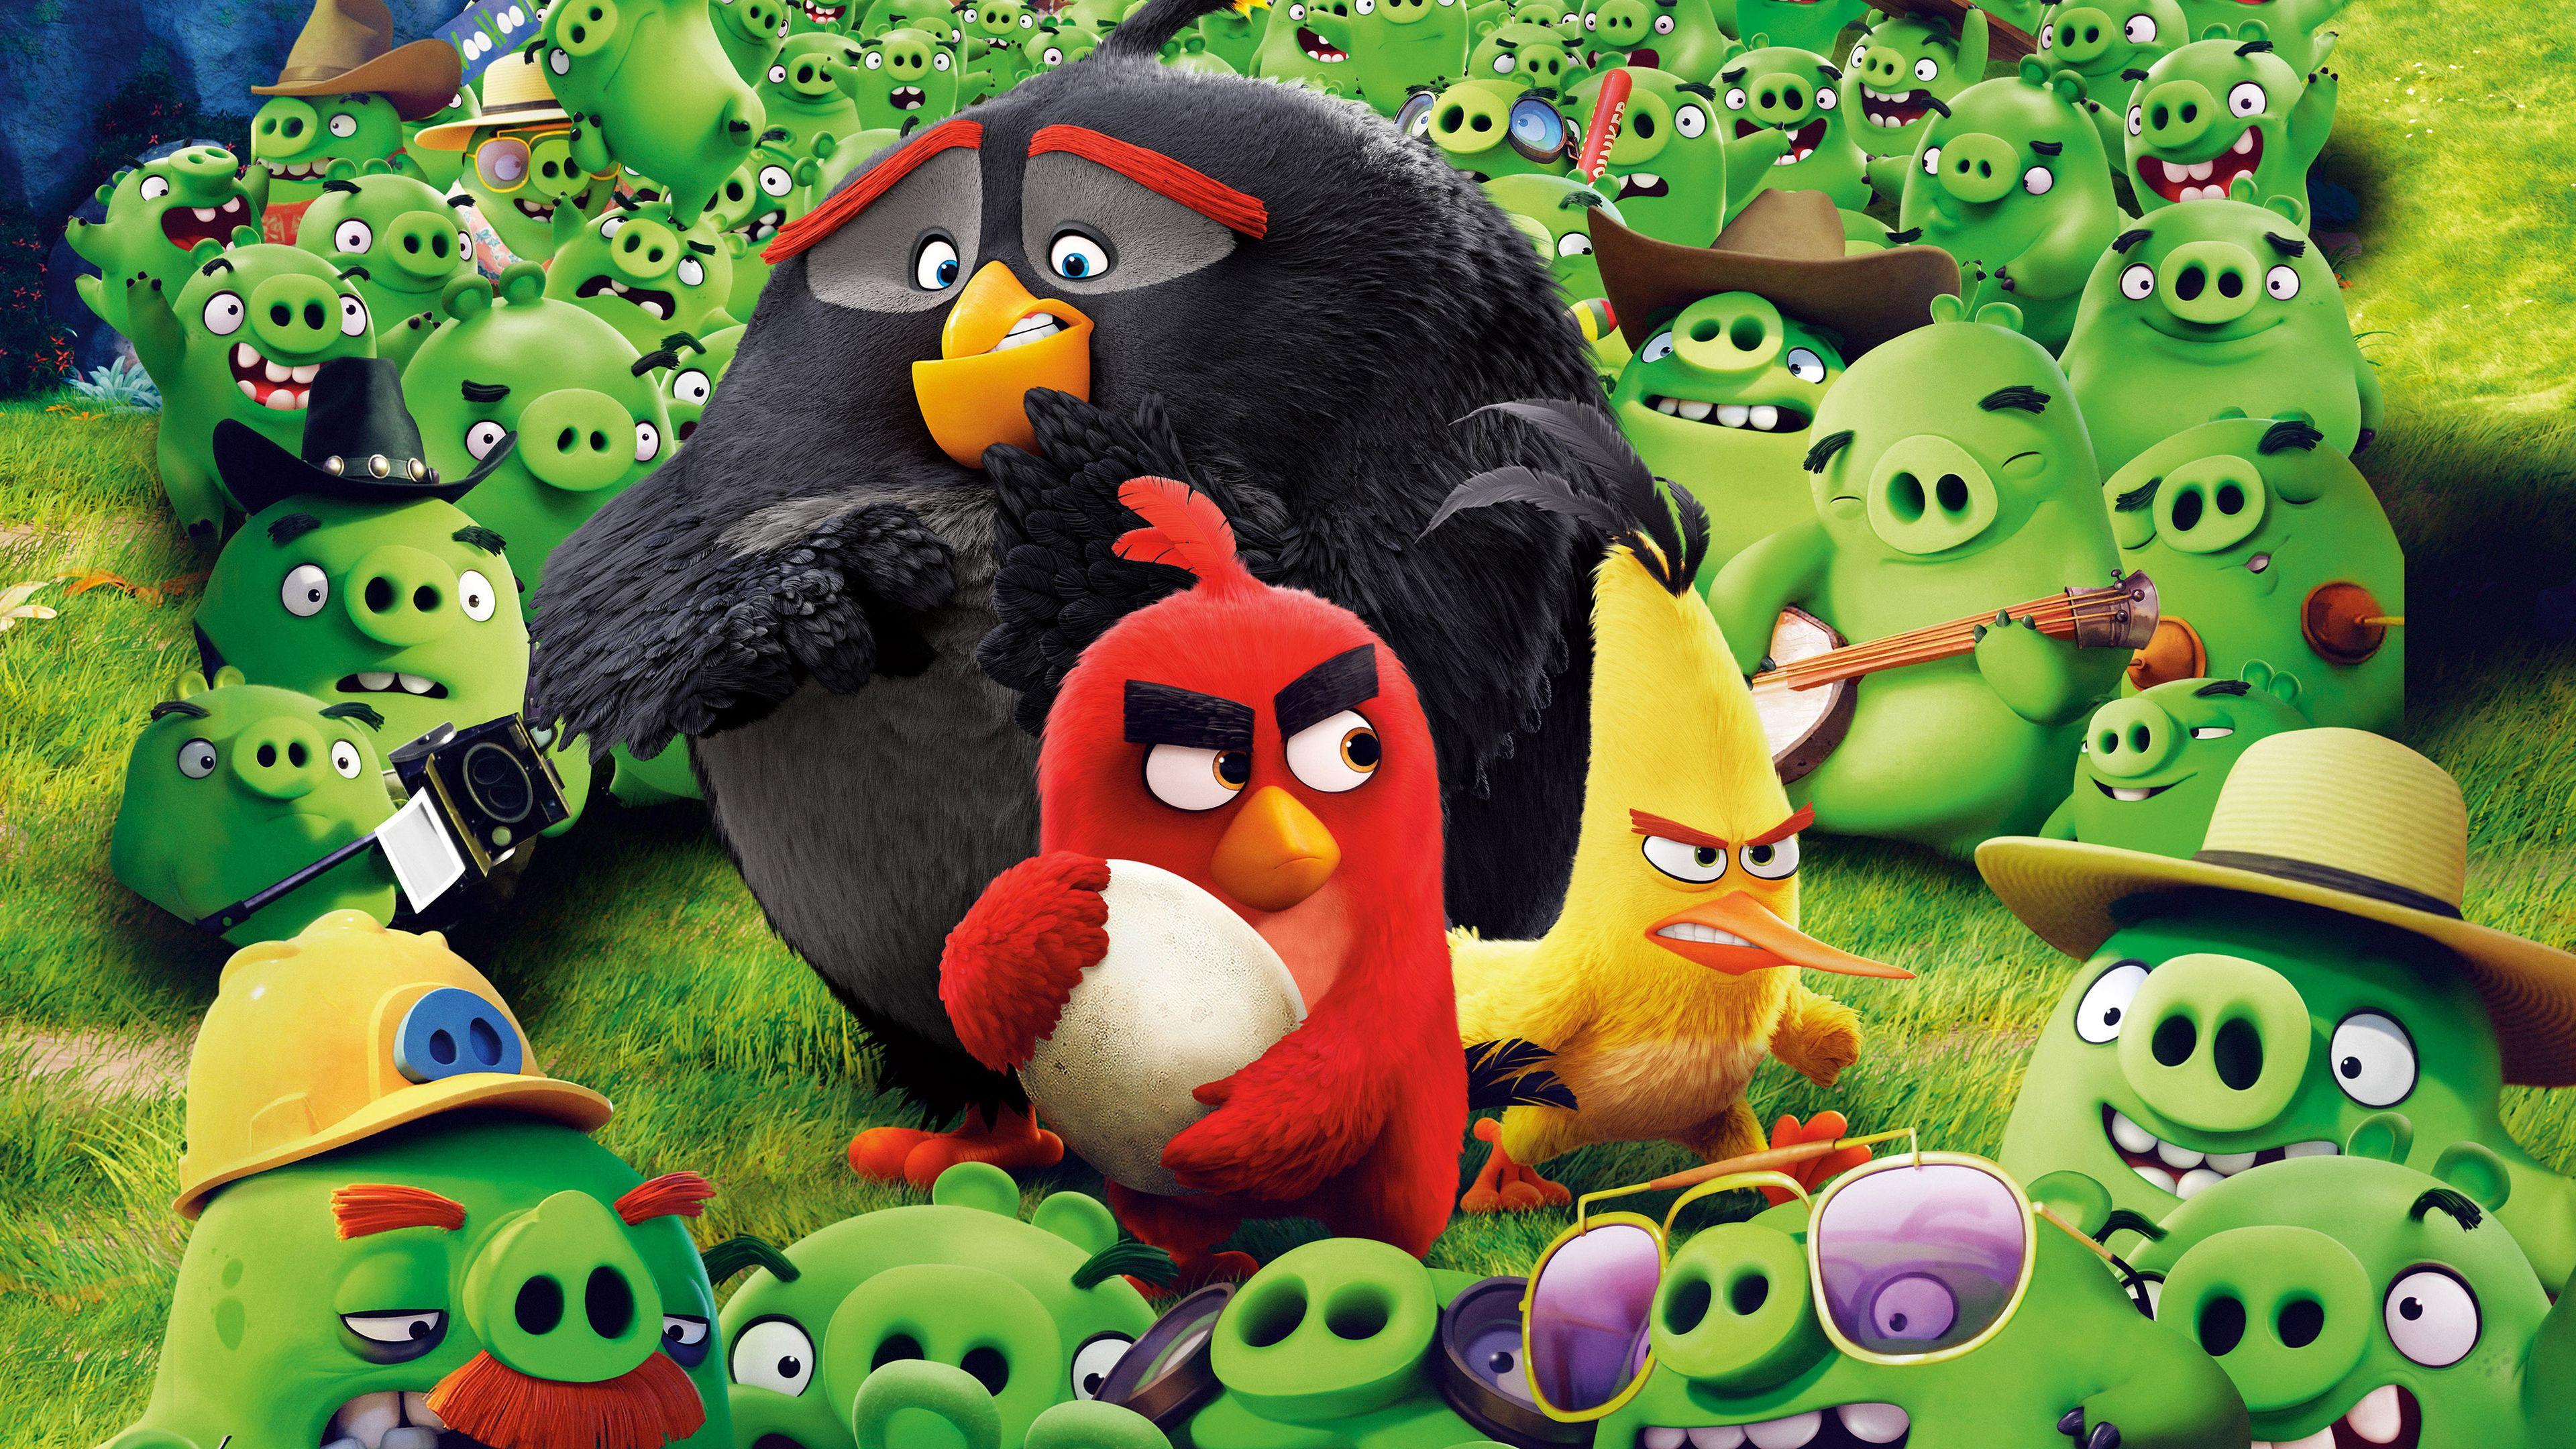 Wallpaper 4k Angry Birds Save The Egg 4k 4k Wallpapers Angry Birds Wallpapers Animated Movies Wallpapers Birds Wallpapers Hd Wallpapers Movies Wallpapers